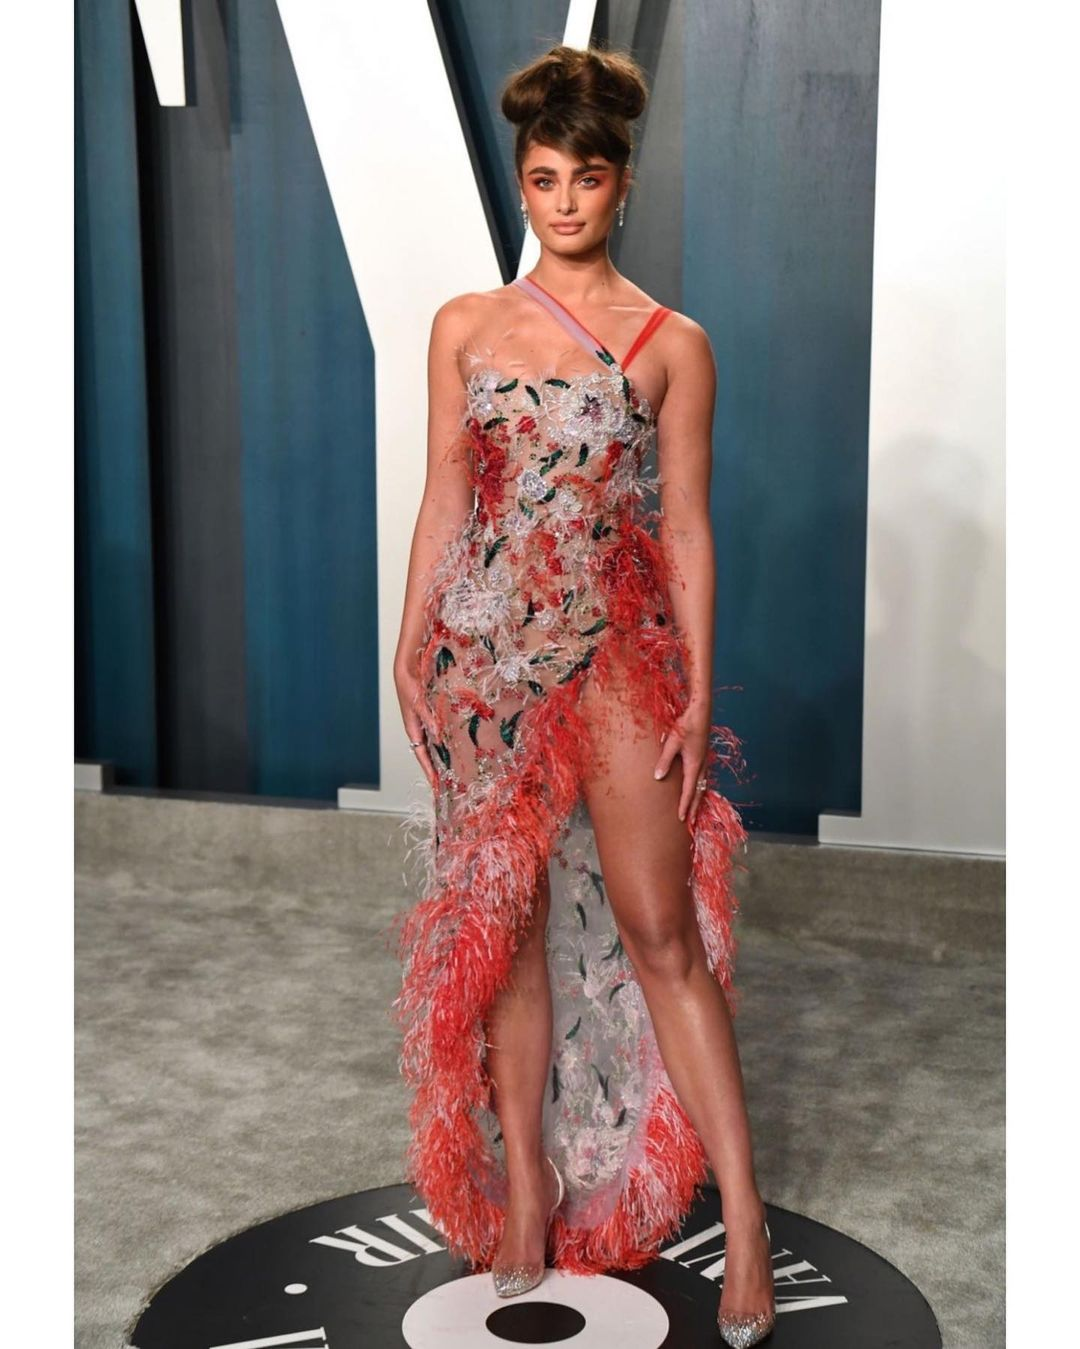 Taylor Hill Split Dress Look Stunning